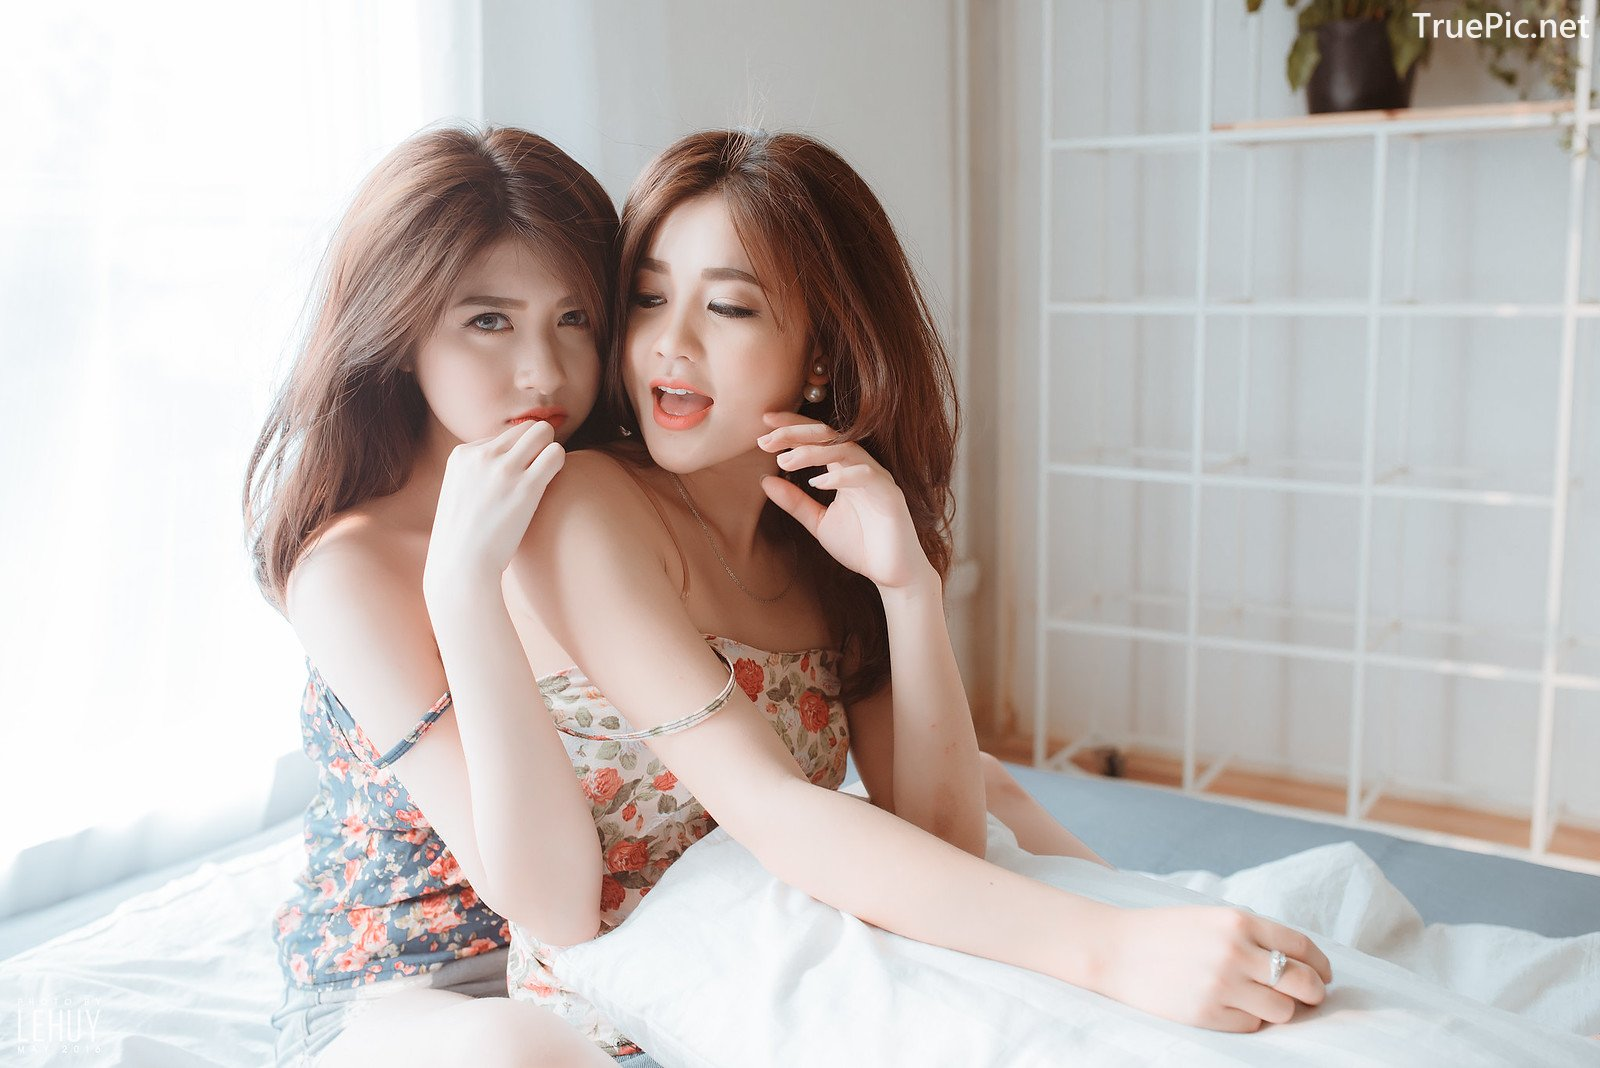 Image-Vietnamese-Hot-Girl-Photo-Beautiful-Twin-Sister-TruePic.net- Picture-2